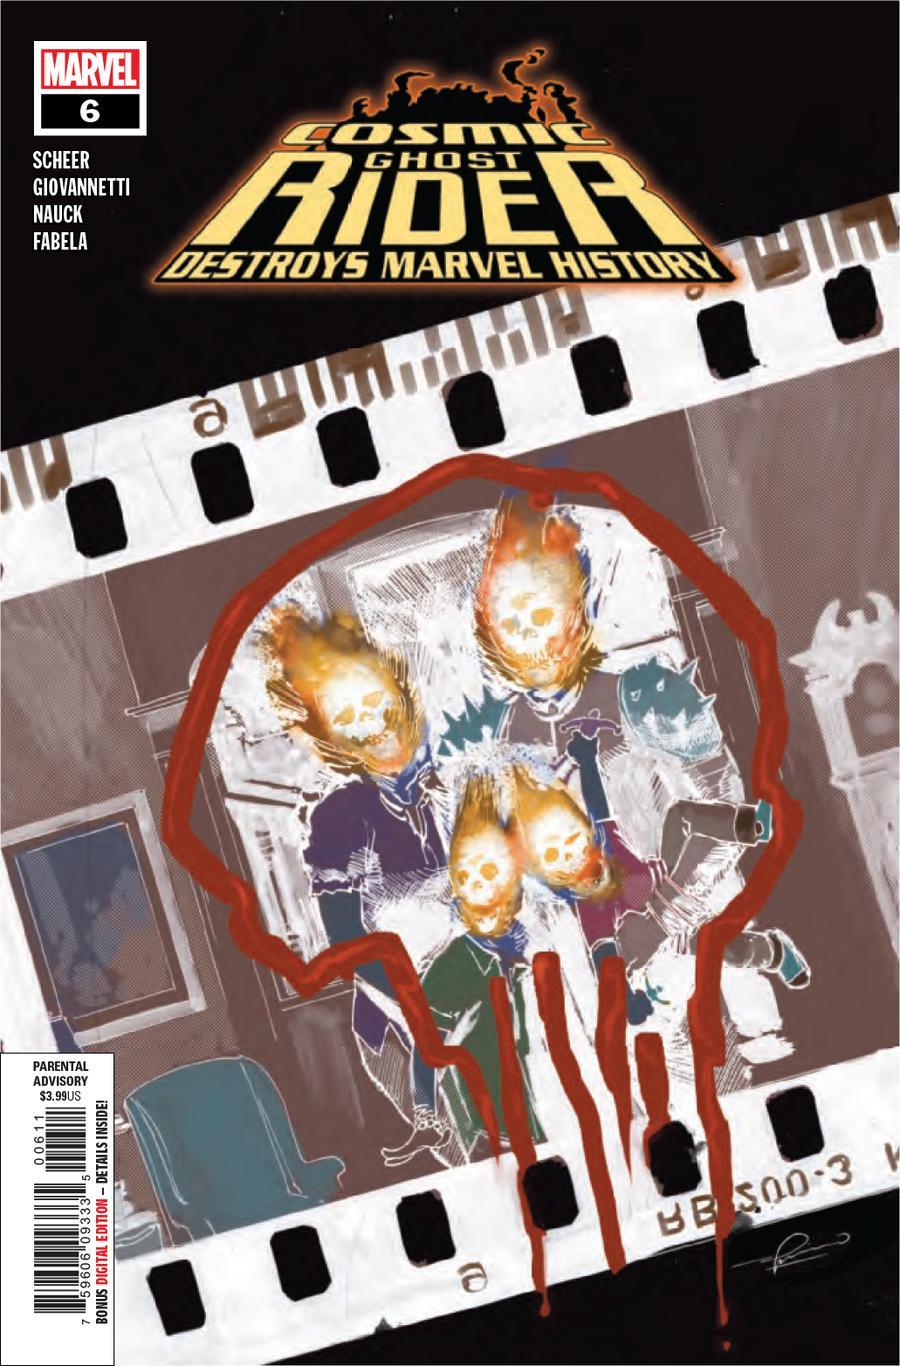 Cosmic Ghost Rider Destroys Marvel History #6 Cover A Regular Gerardo Zaffino Cover